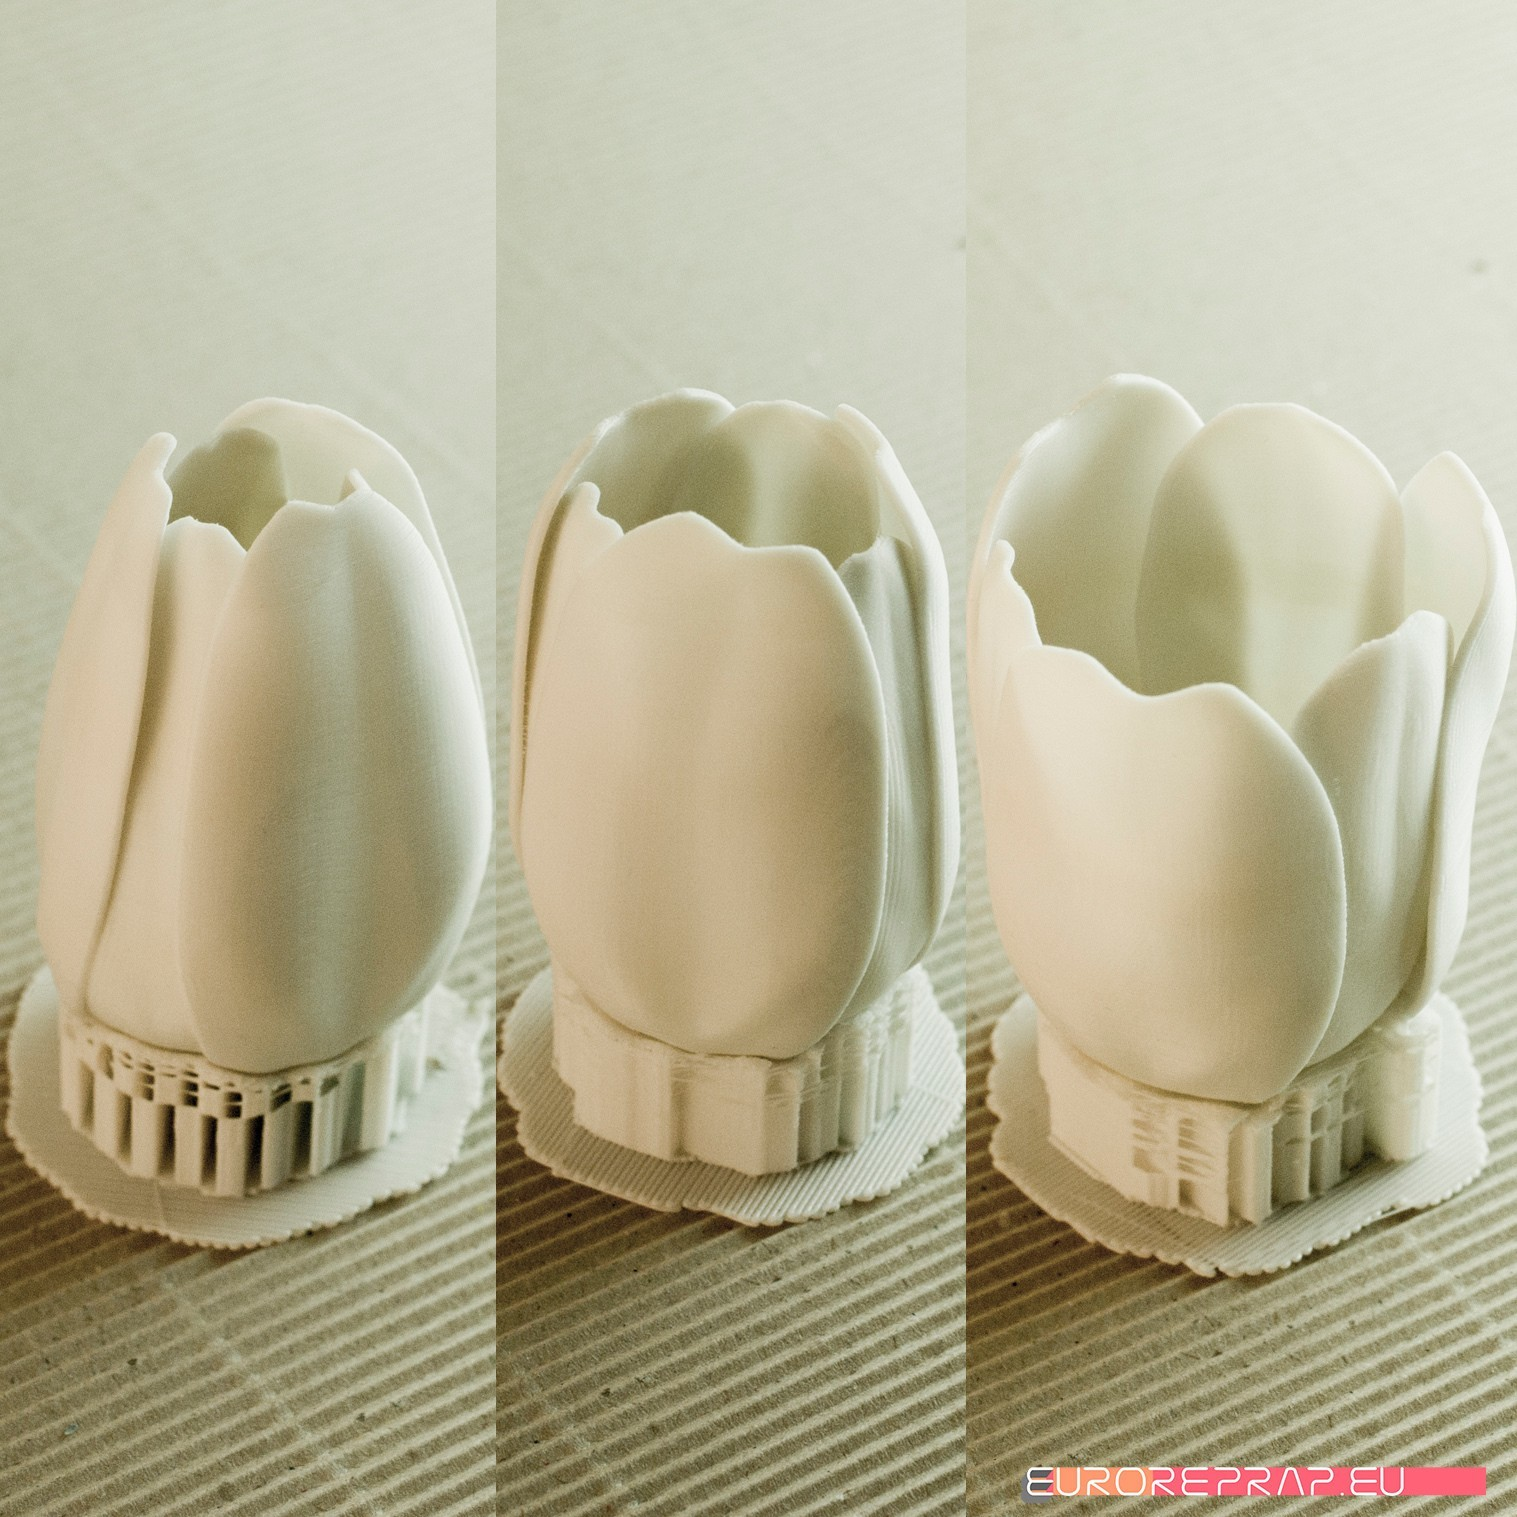 07.jpg Download STL file flowers: Tulip - 3D printable model • 3D printable design, euroreprap_eu